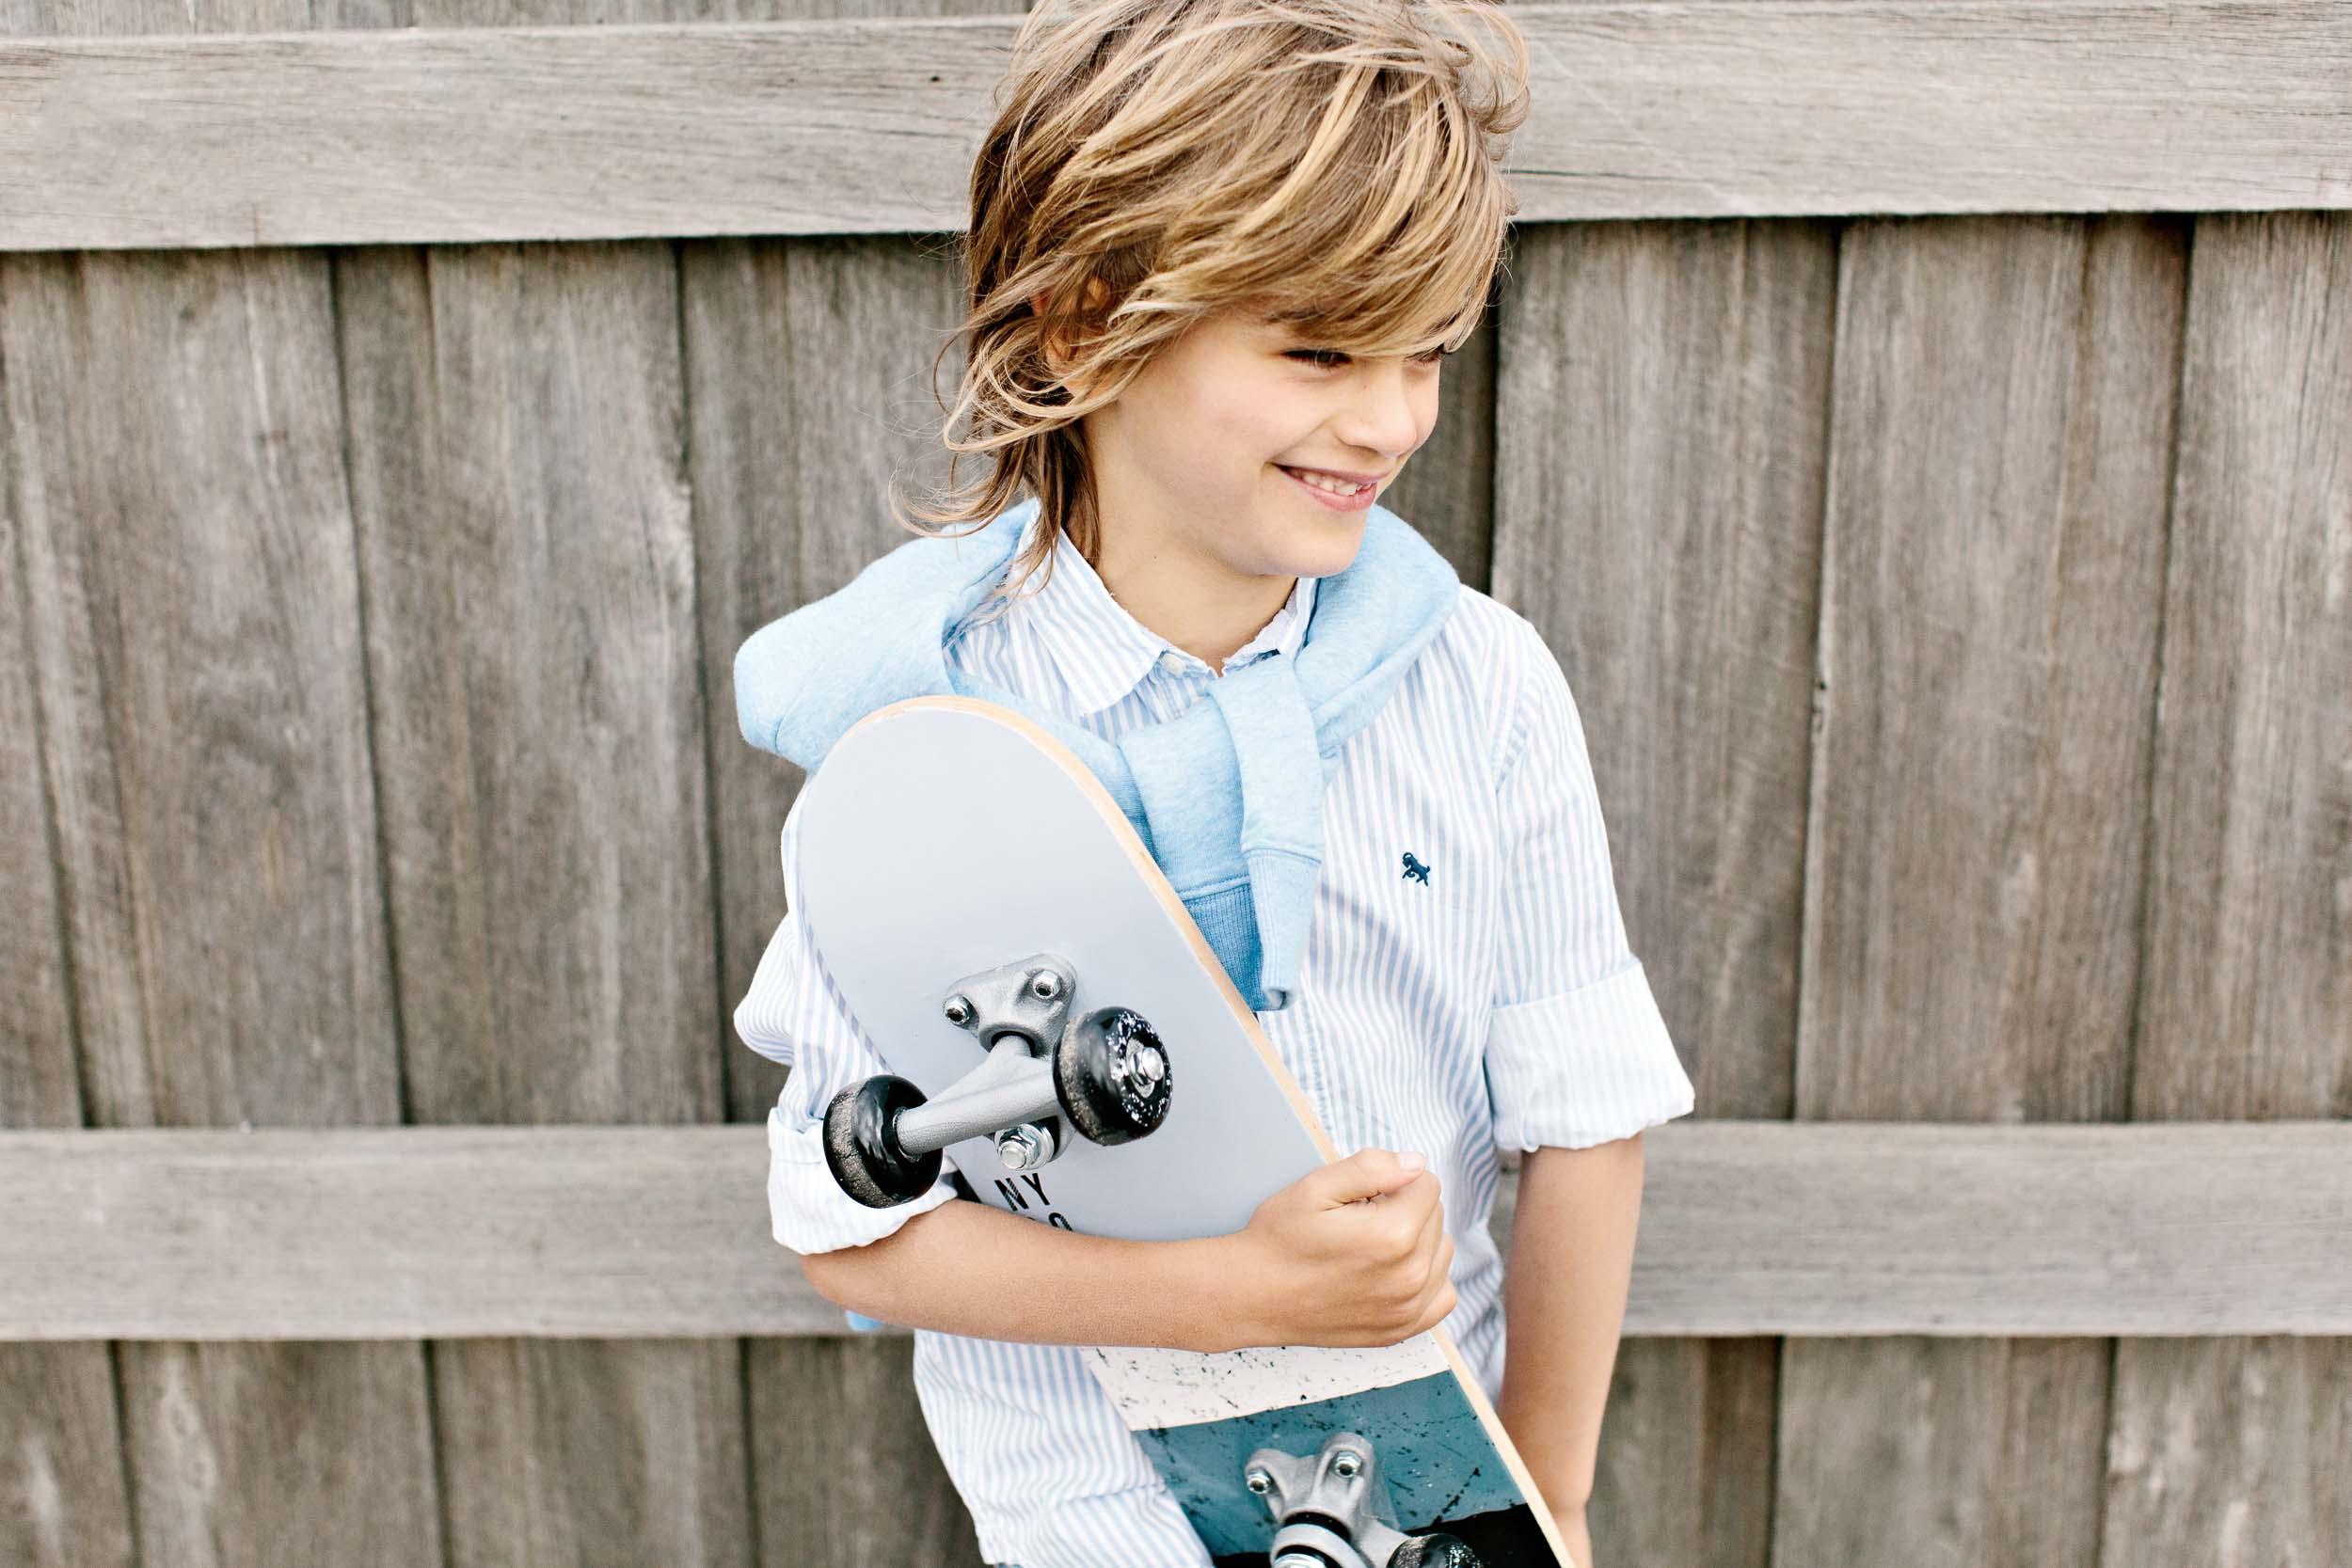 Kas-Richards-LENZO_Betts-Kids-Shoes-291.jpg